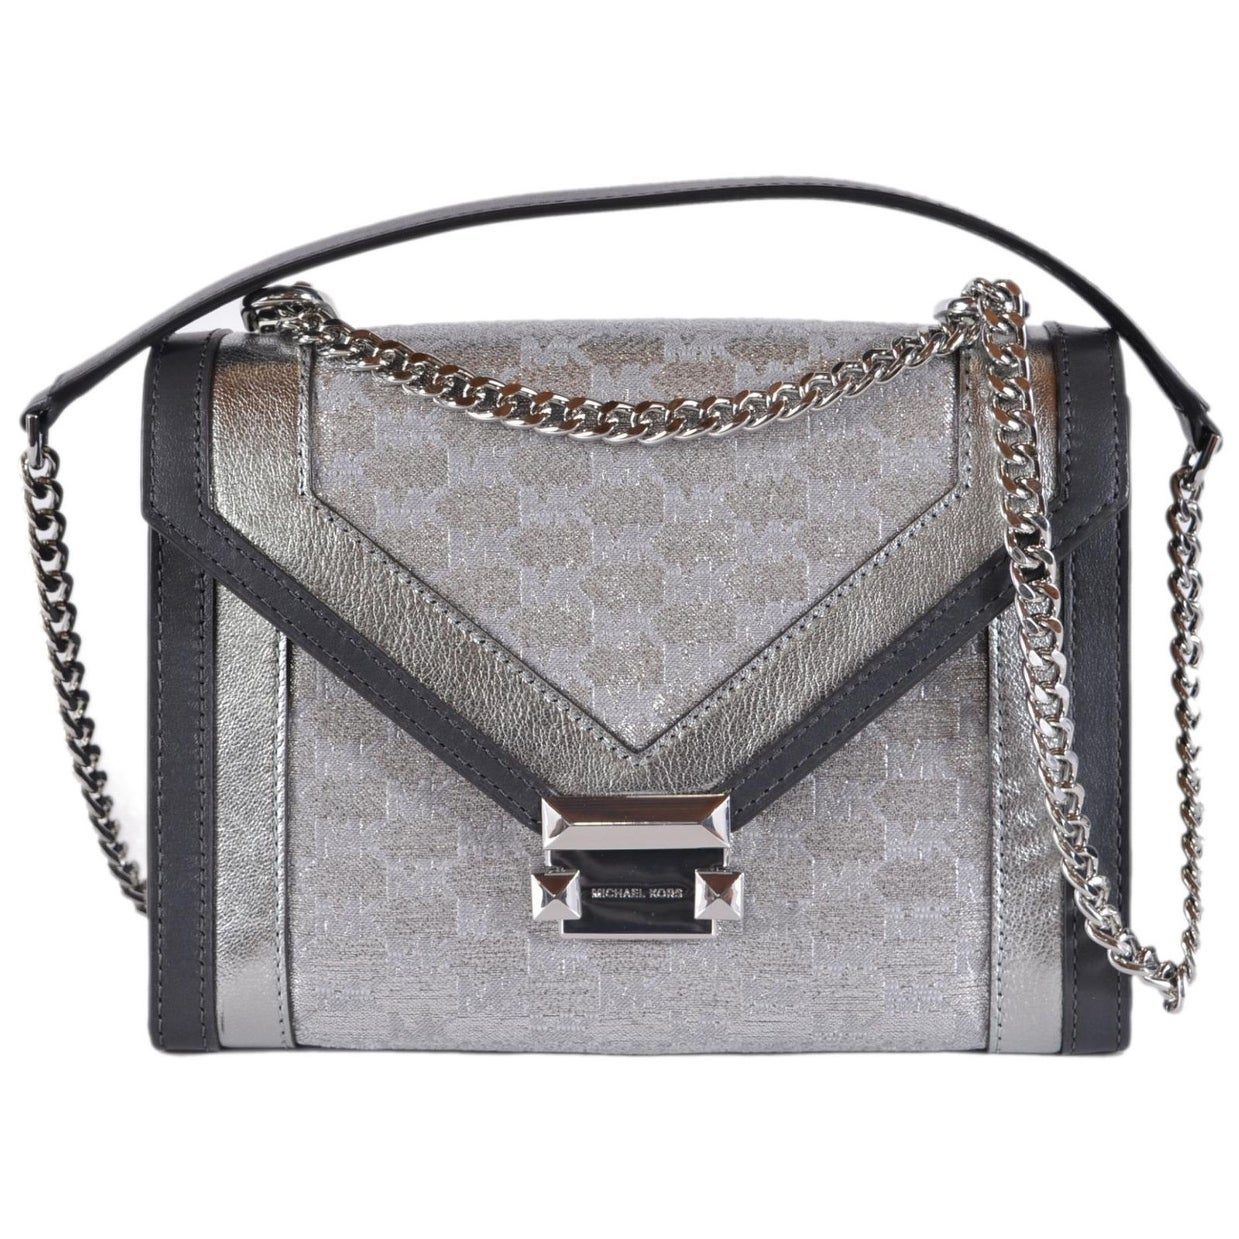 115daa7df073 Shop Michael Kors Whitney Large Metallic Logo Jacquard Convertible Shoulder  Bag - Free Shipping Today - Overstock - 26444405